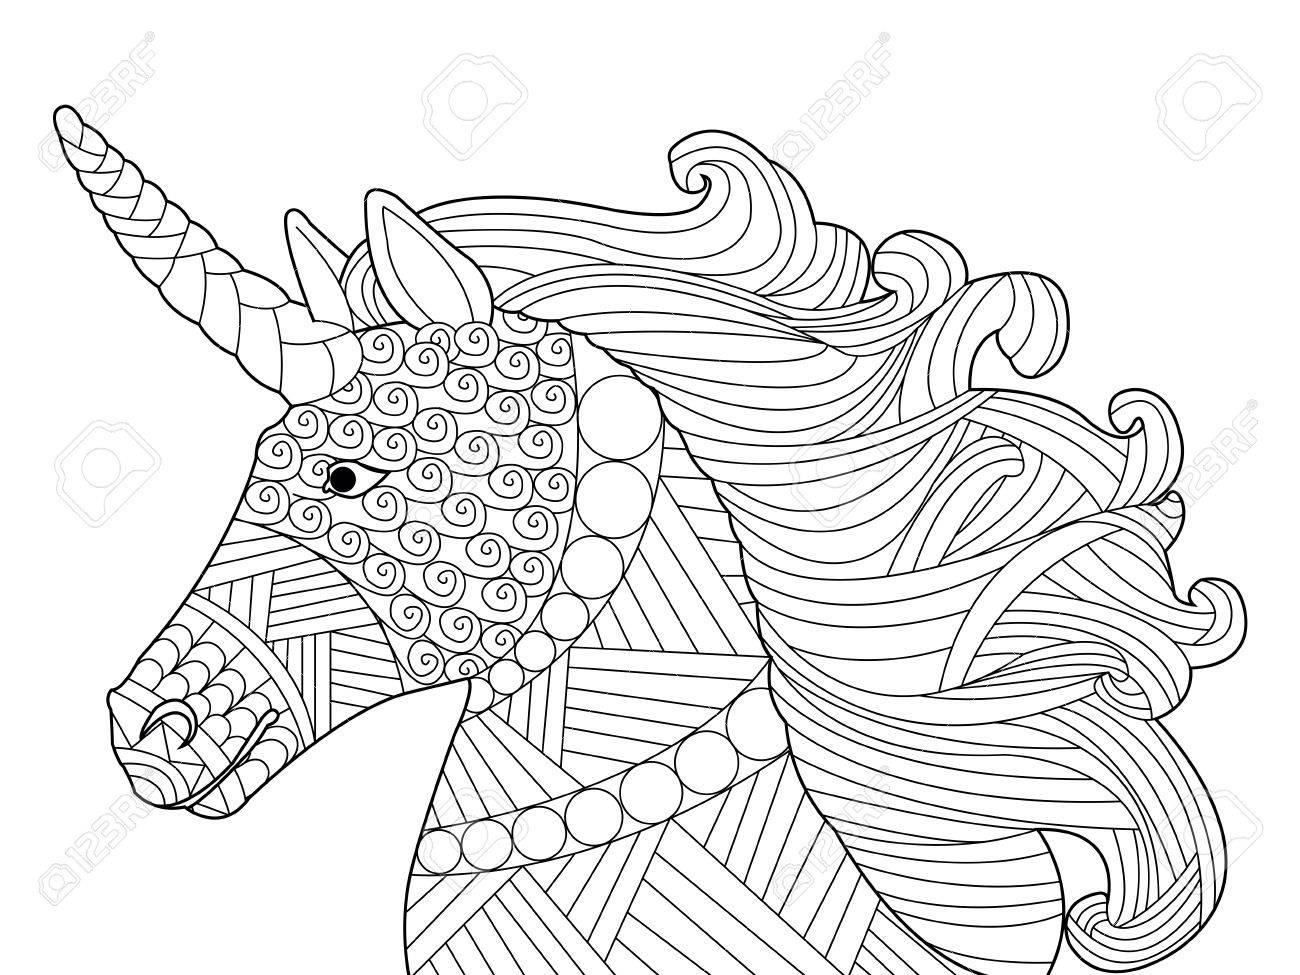 Libro Para Colorear Cabeza De Unicornio Para Los Adultos Como Vector ...